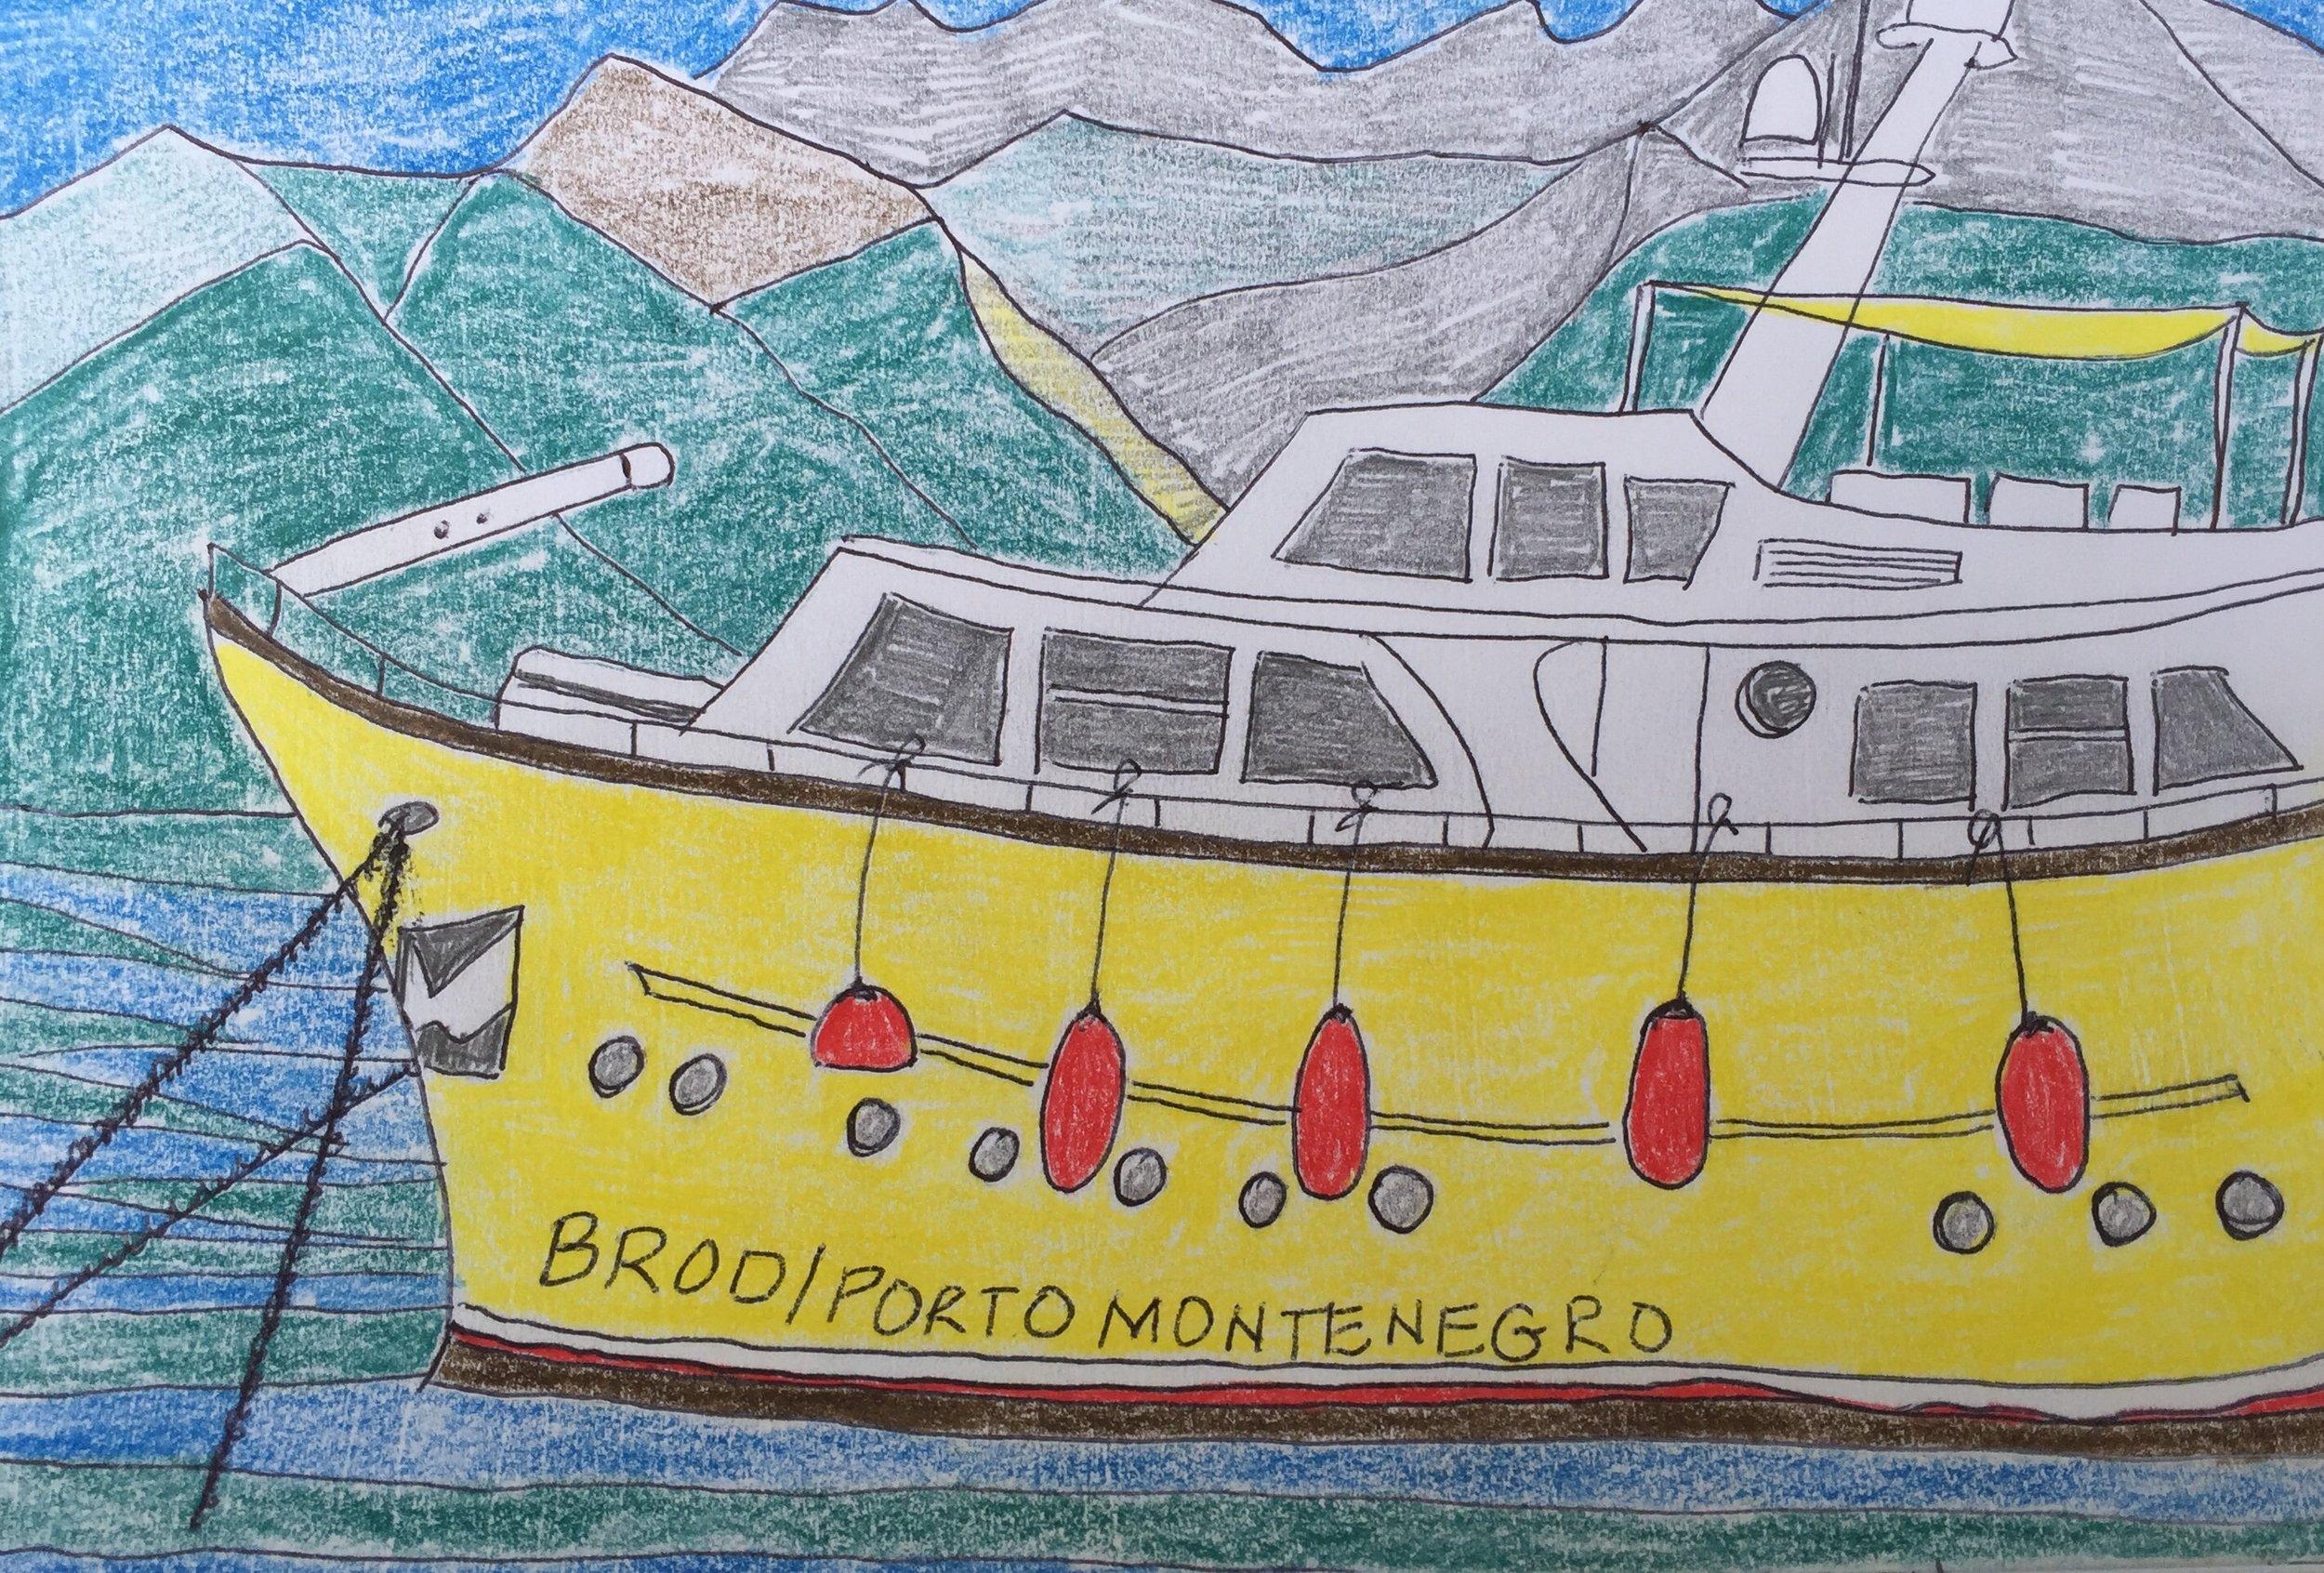 Porto Montenegro boat